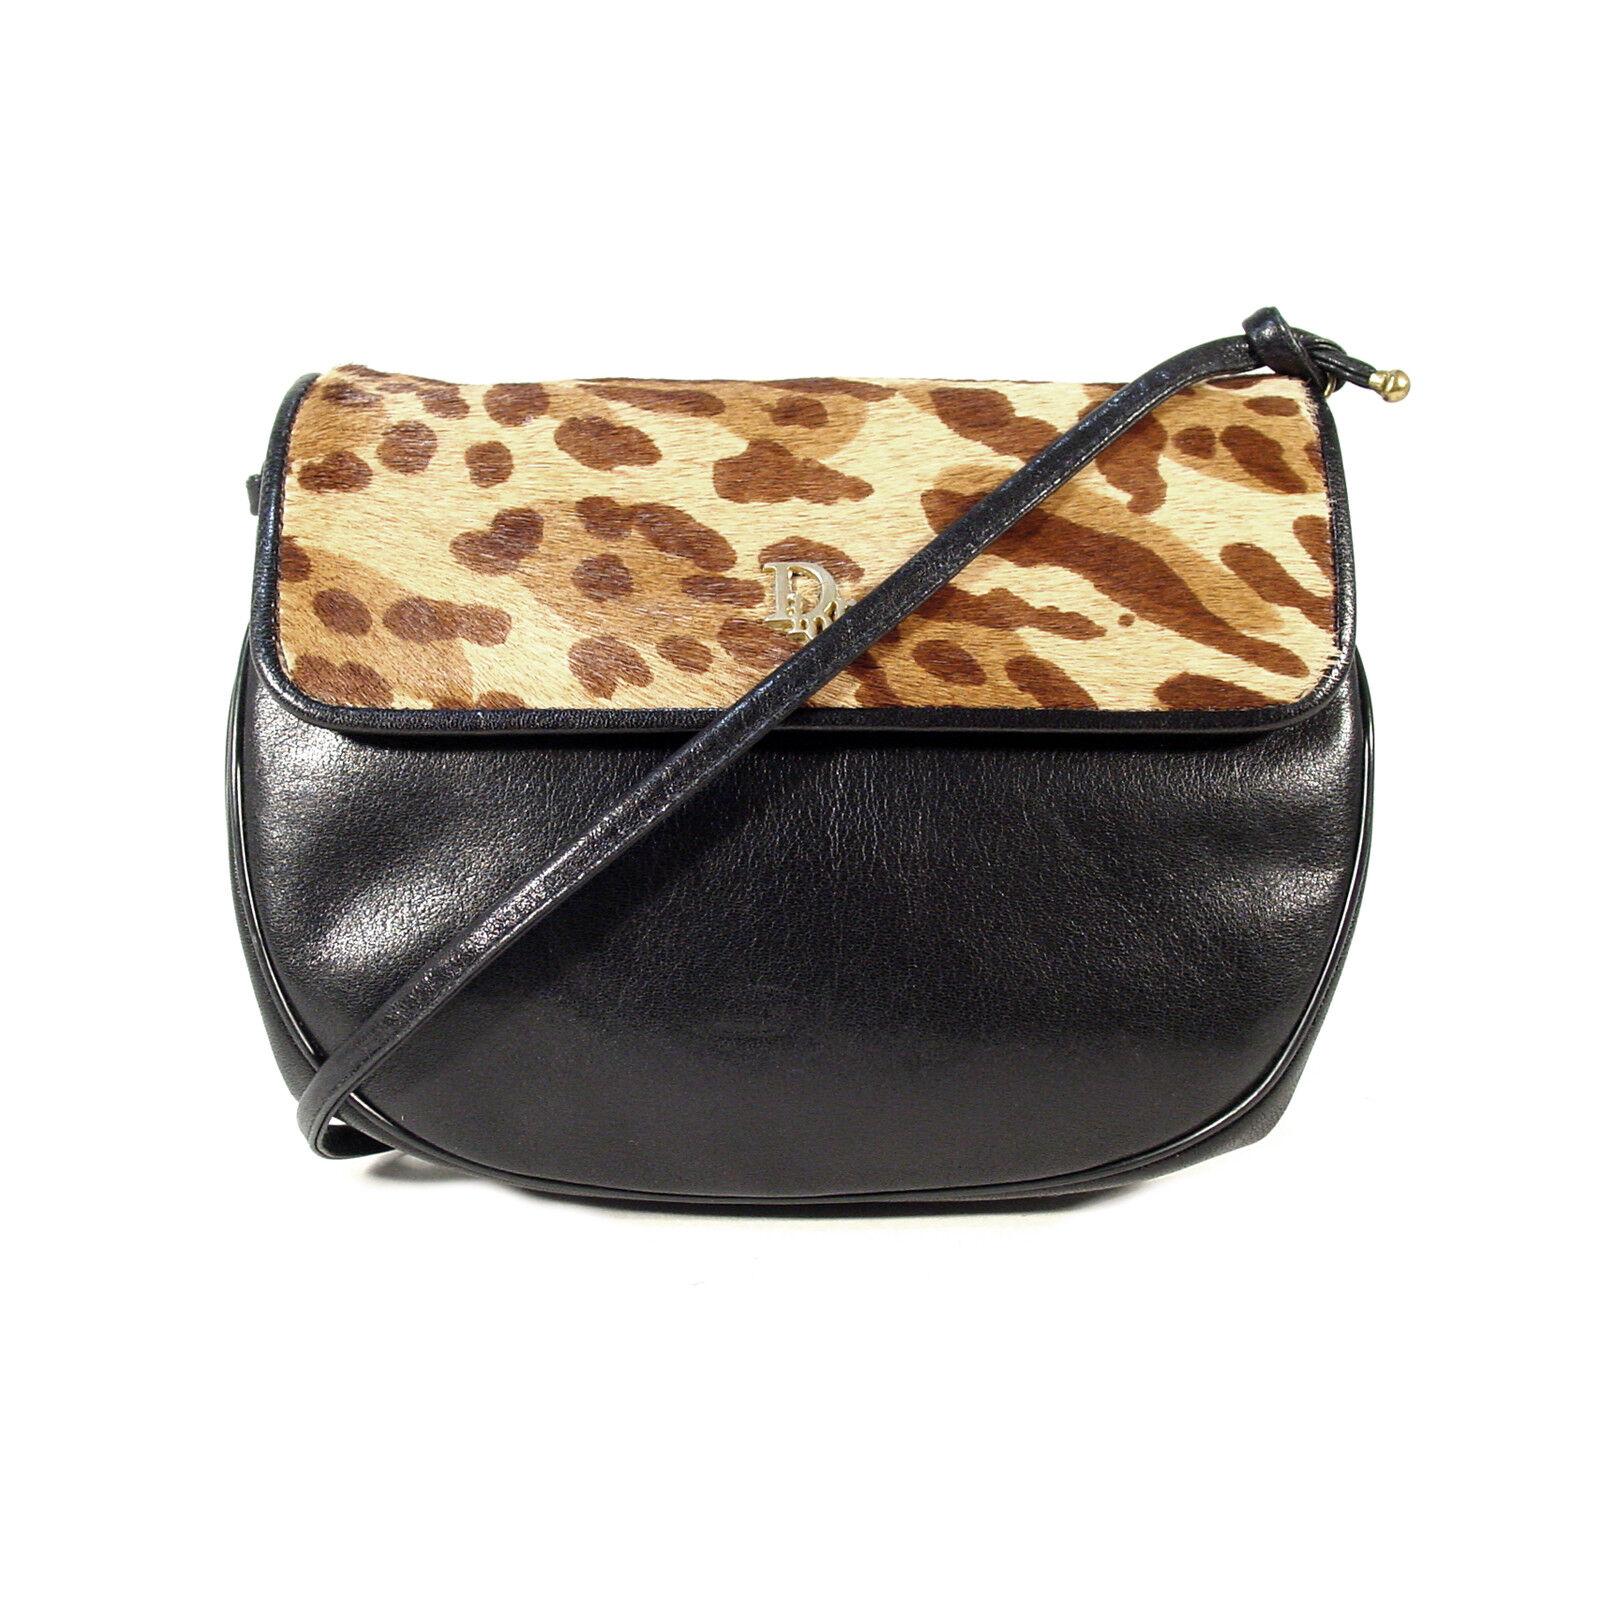 4ccf94c032c4 Details about DIOR Authentic Vintage Leopard Print Calf Hair Flap Small Crossbody  Handbag